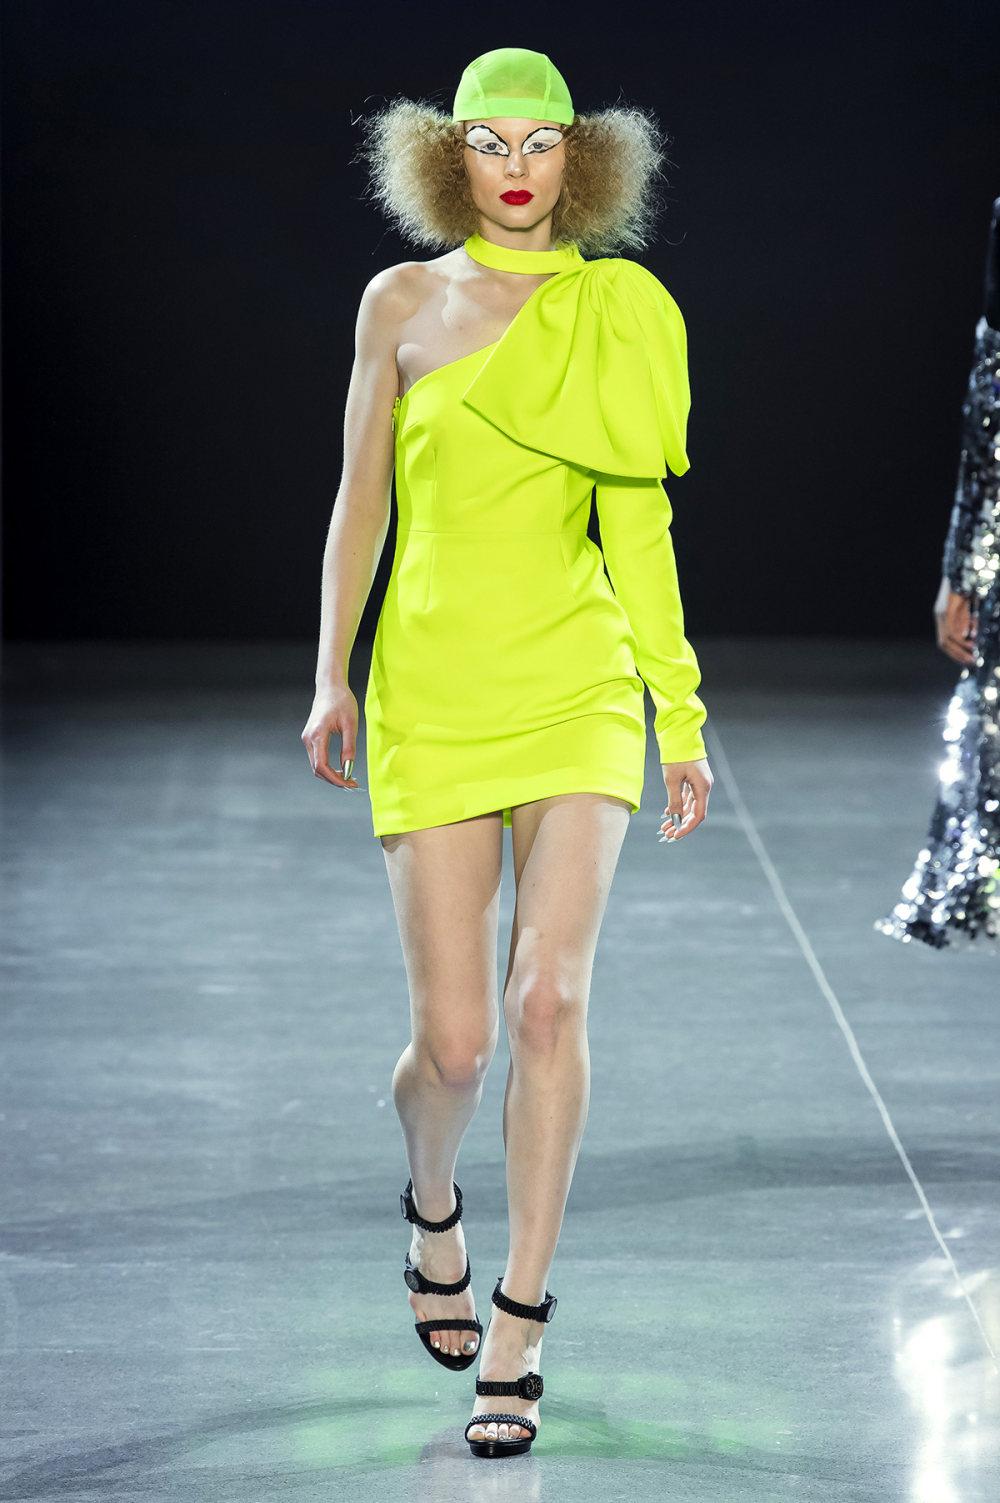 Christian Cowan时装系列虽然巨大的薄纱层状服装并没有那么特别-29.jpg